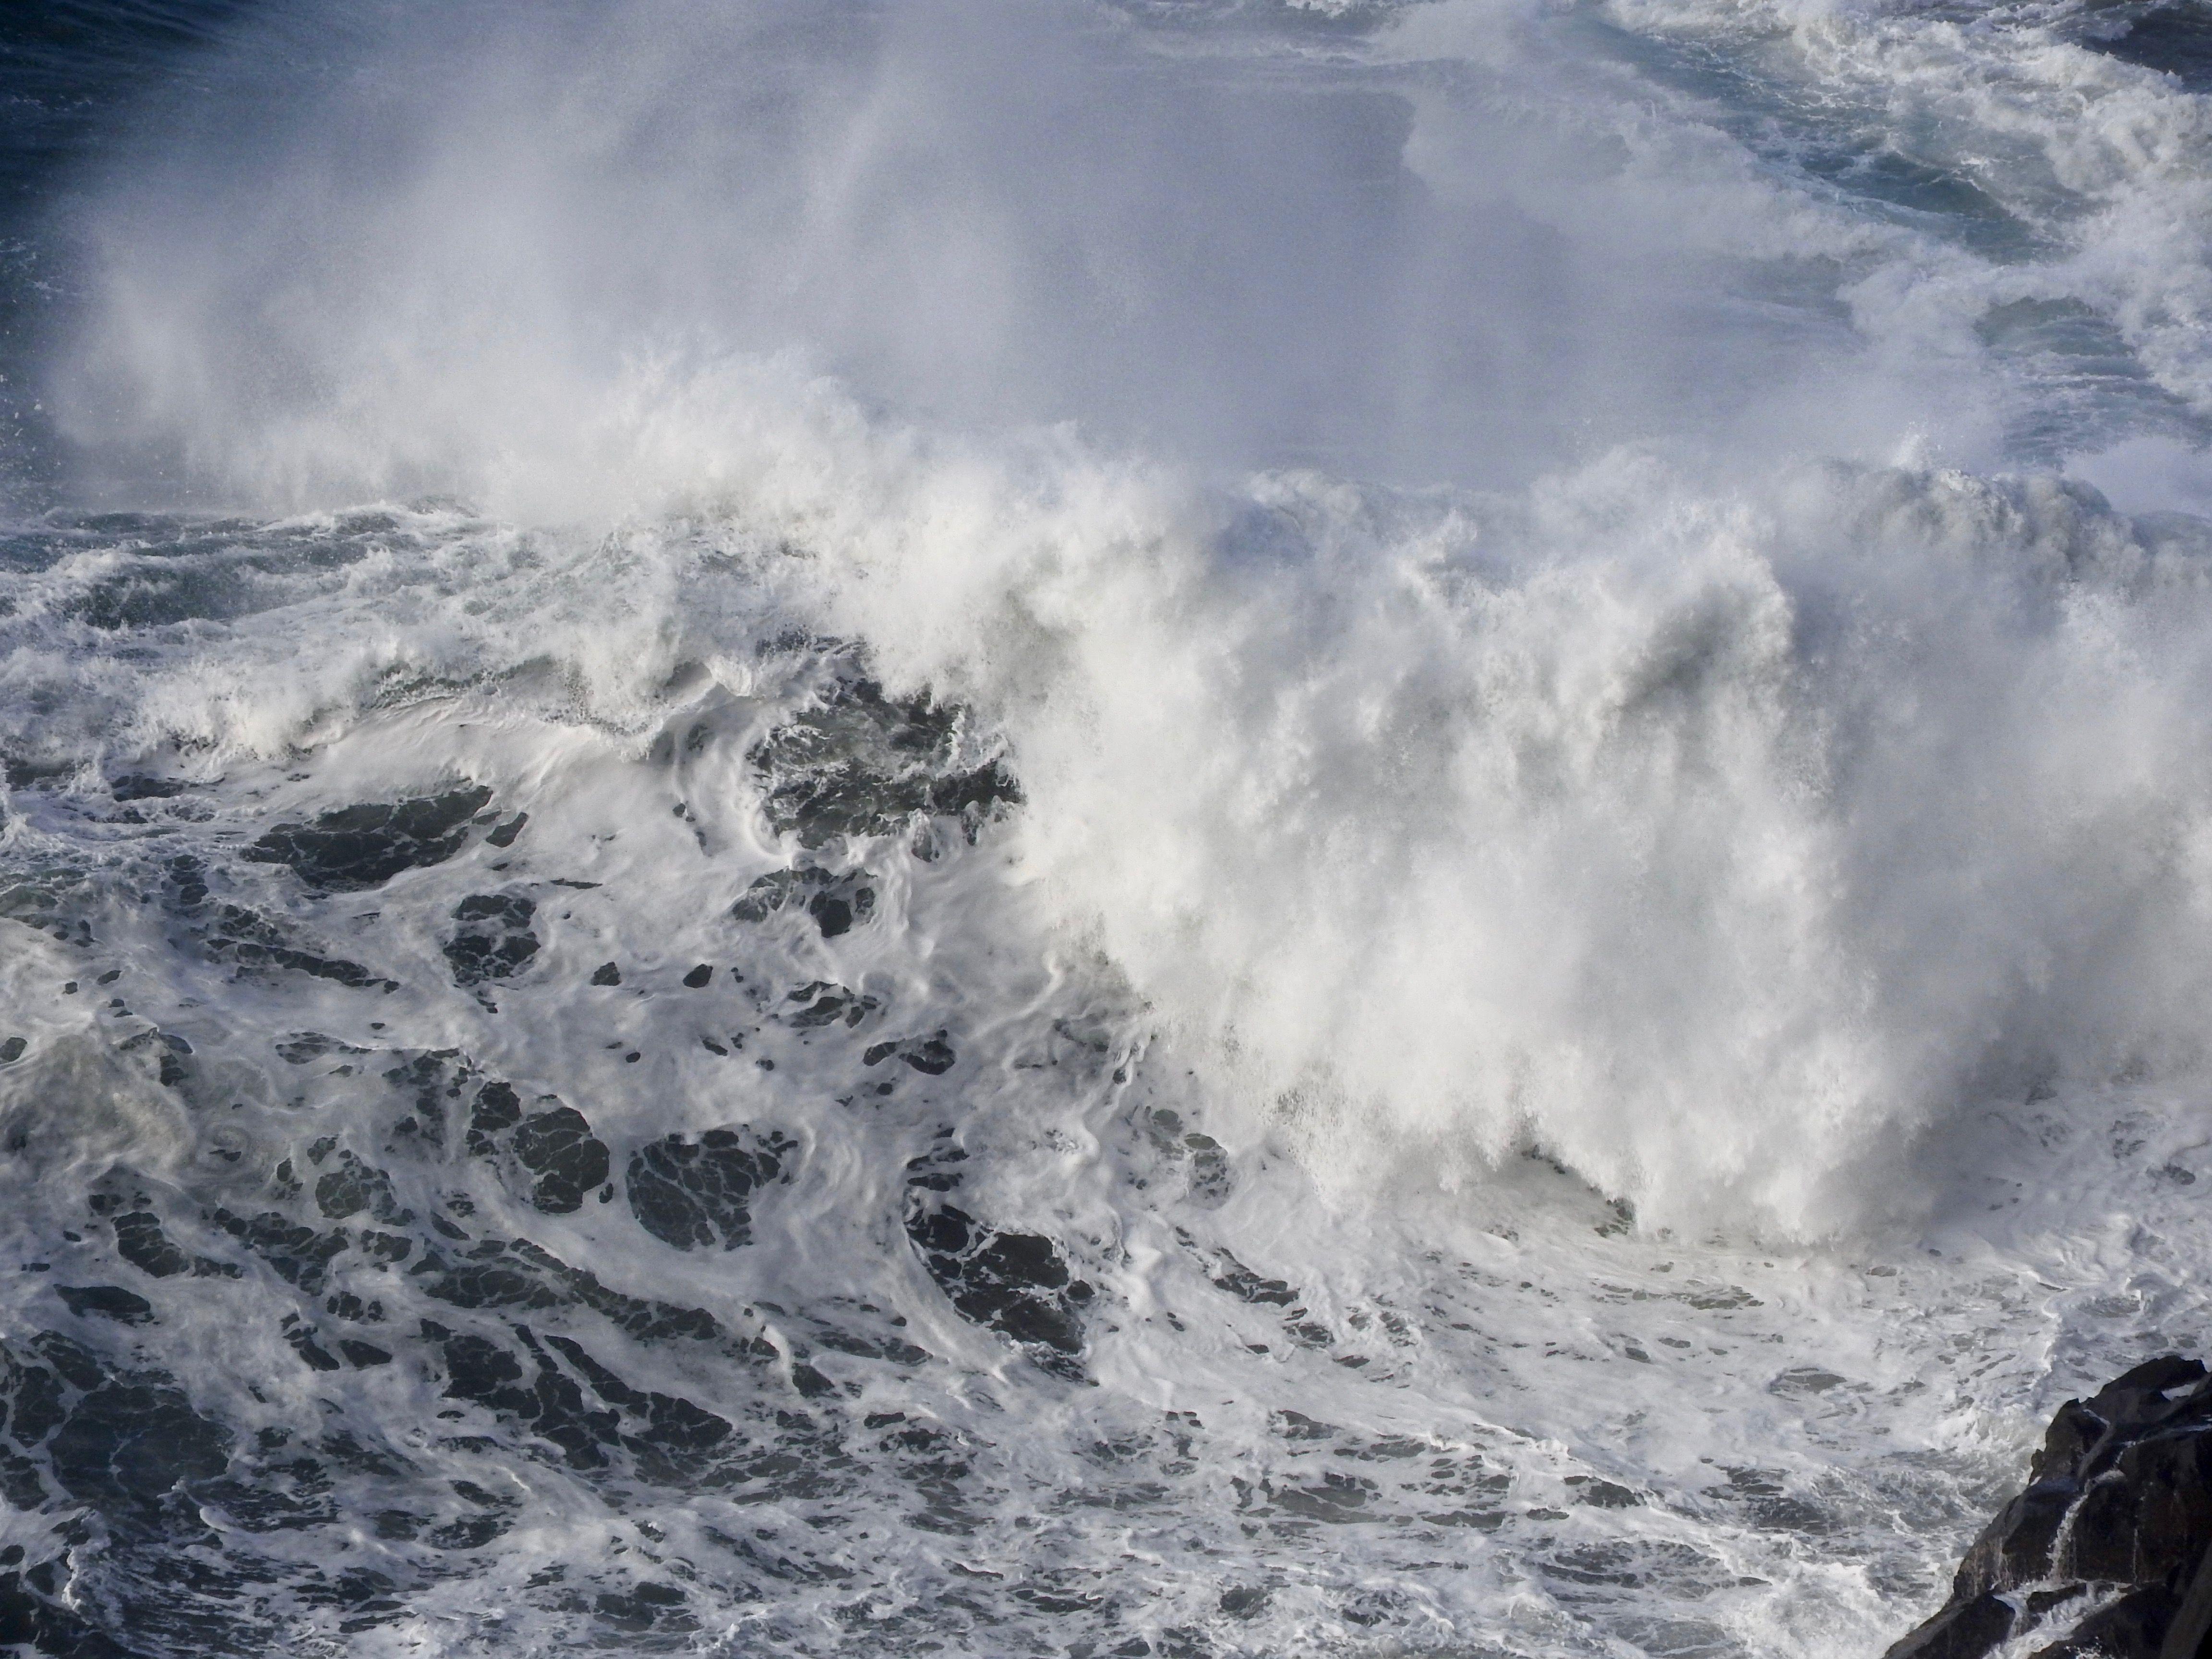 stormy ocean waves crashing on rocks   My Photos   Instagram, Videos